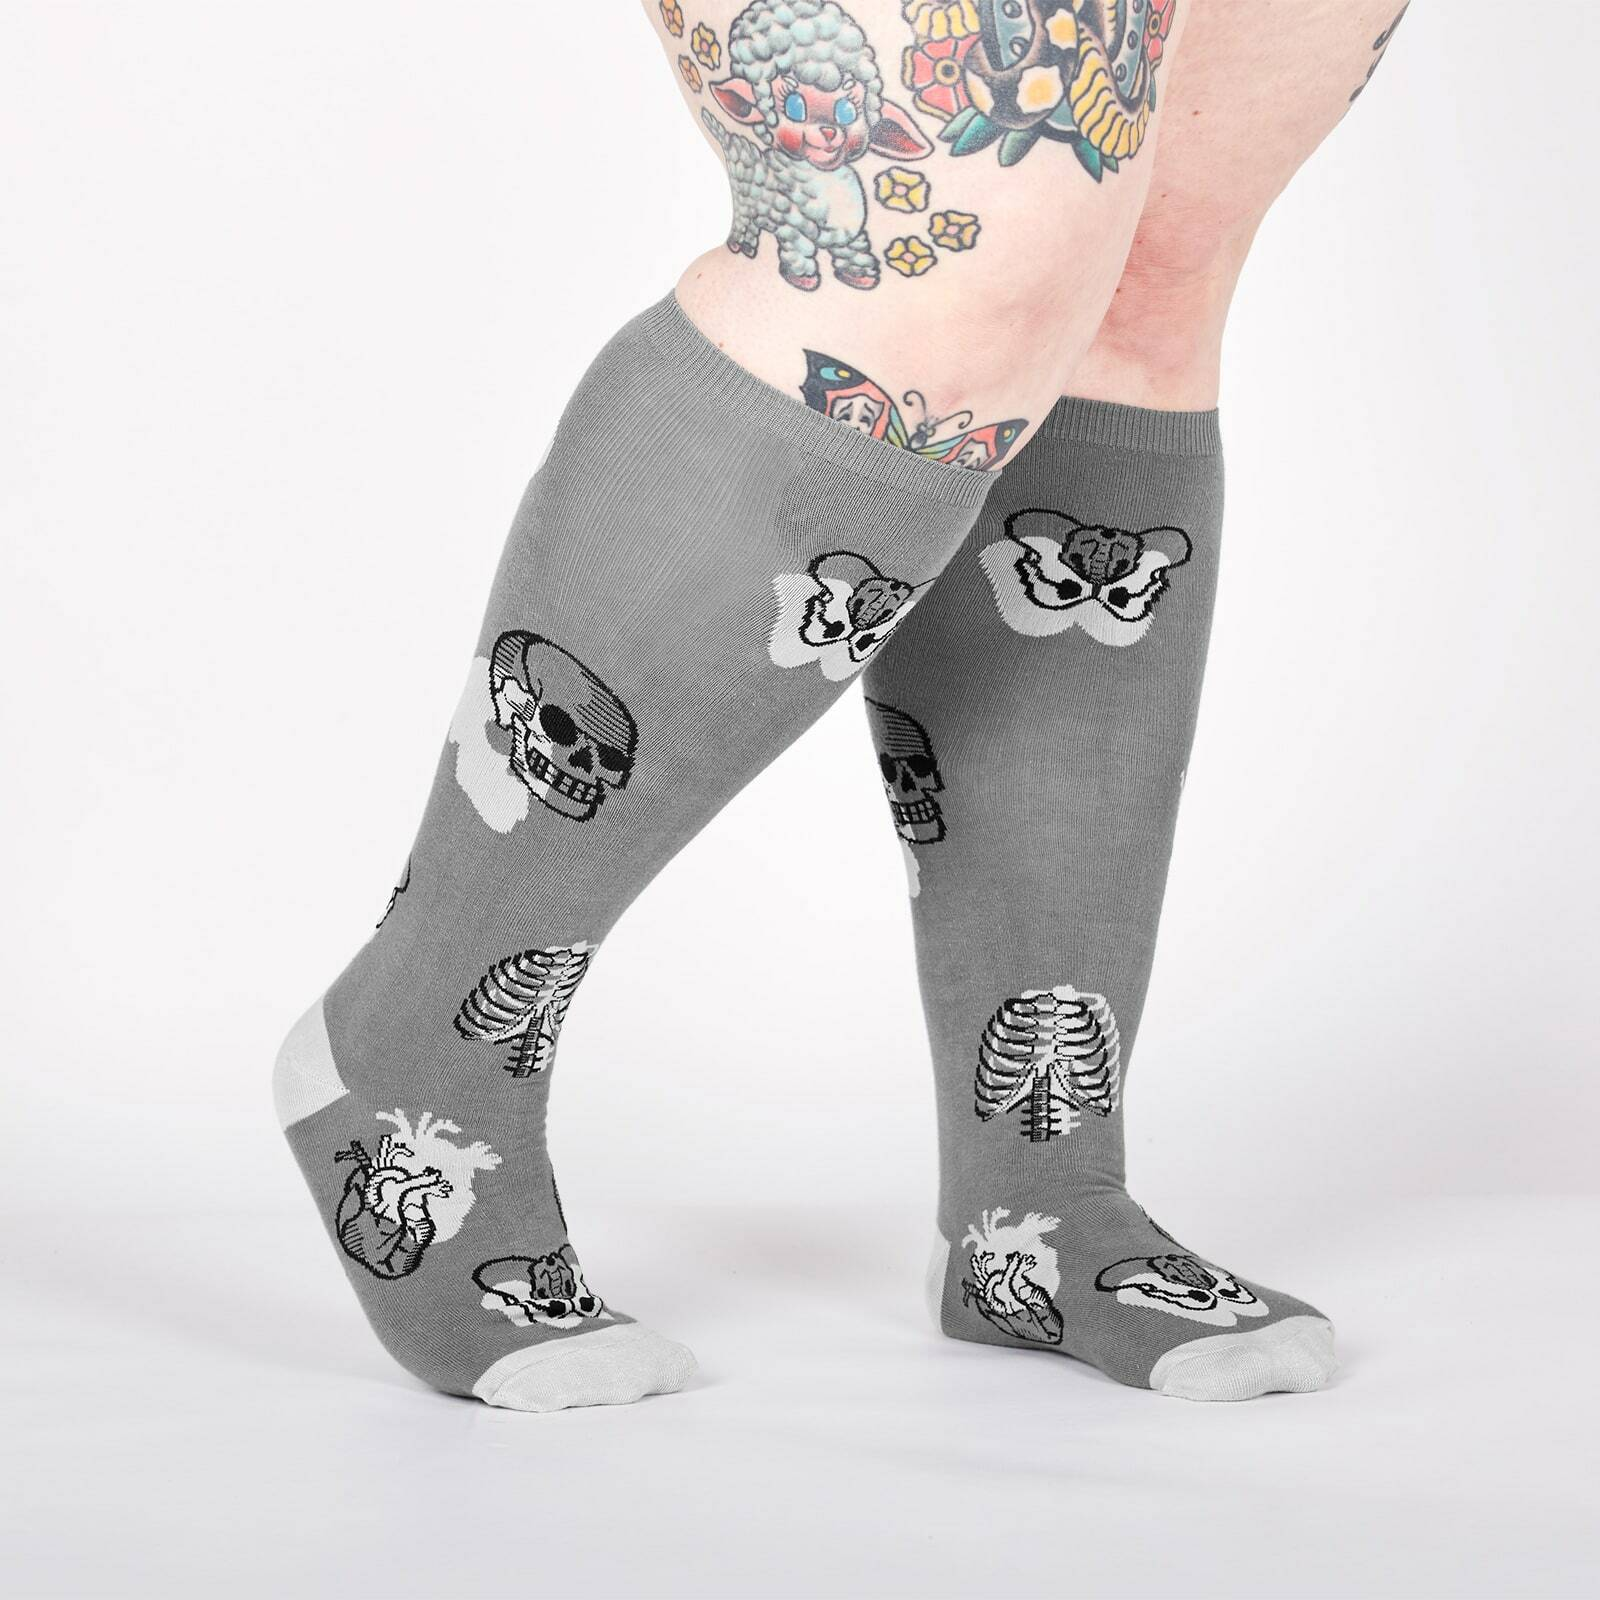 model wearing STRETCH-IT™ Head Over Heel - Wide Calf - Human Anatomy Knee High Socks Grey - Unisex